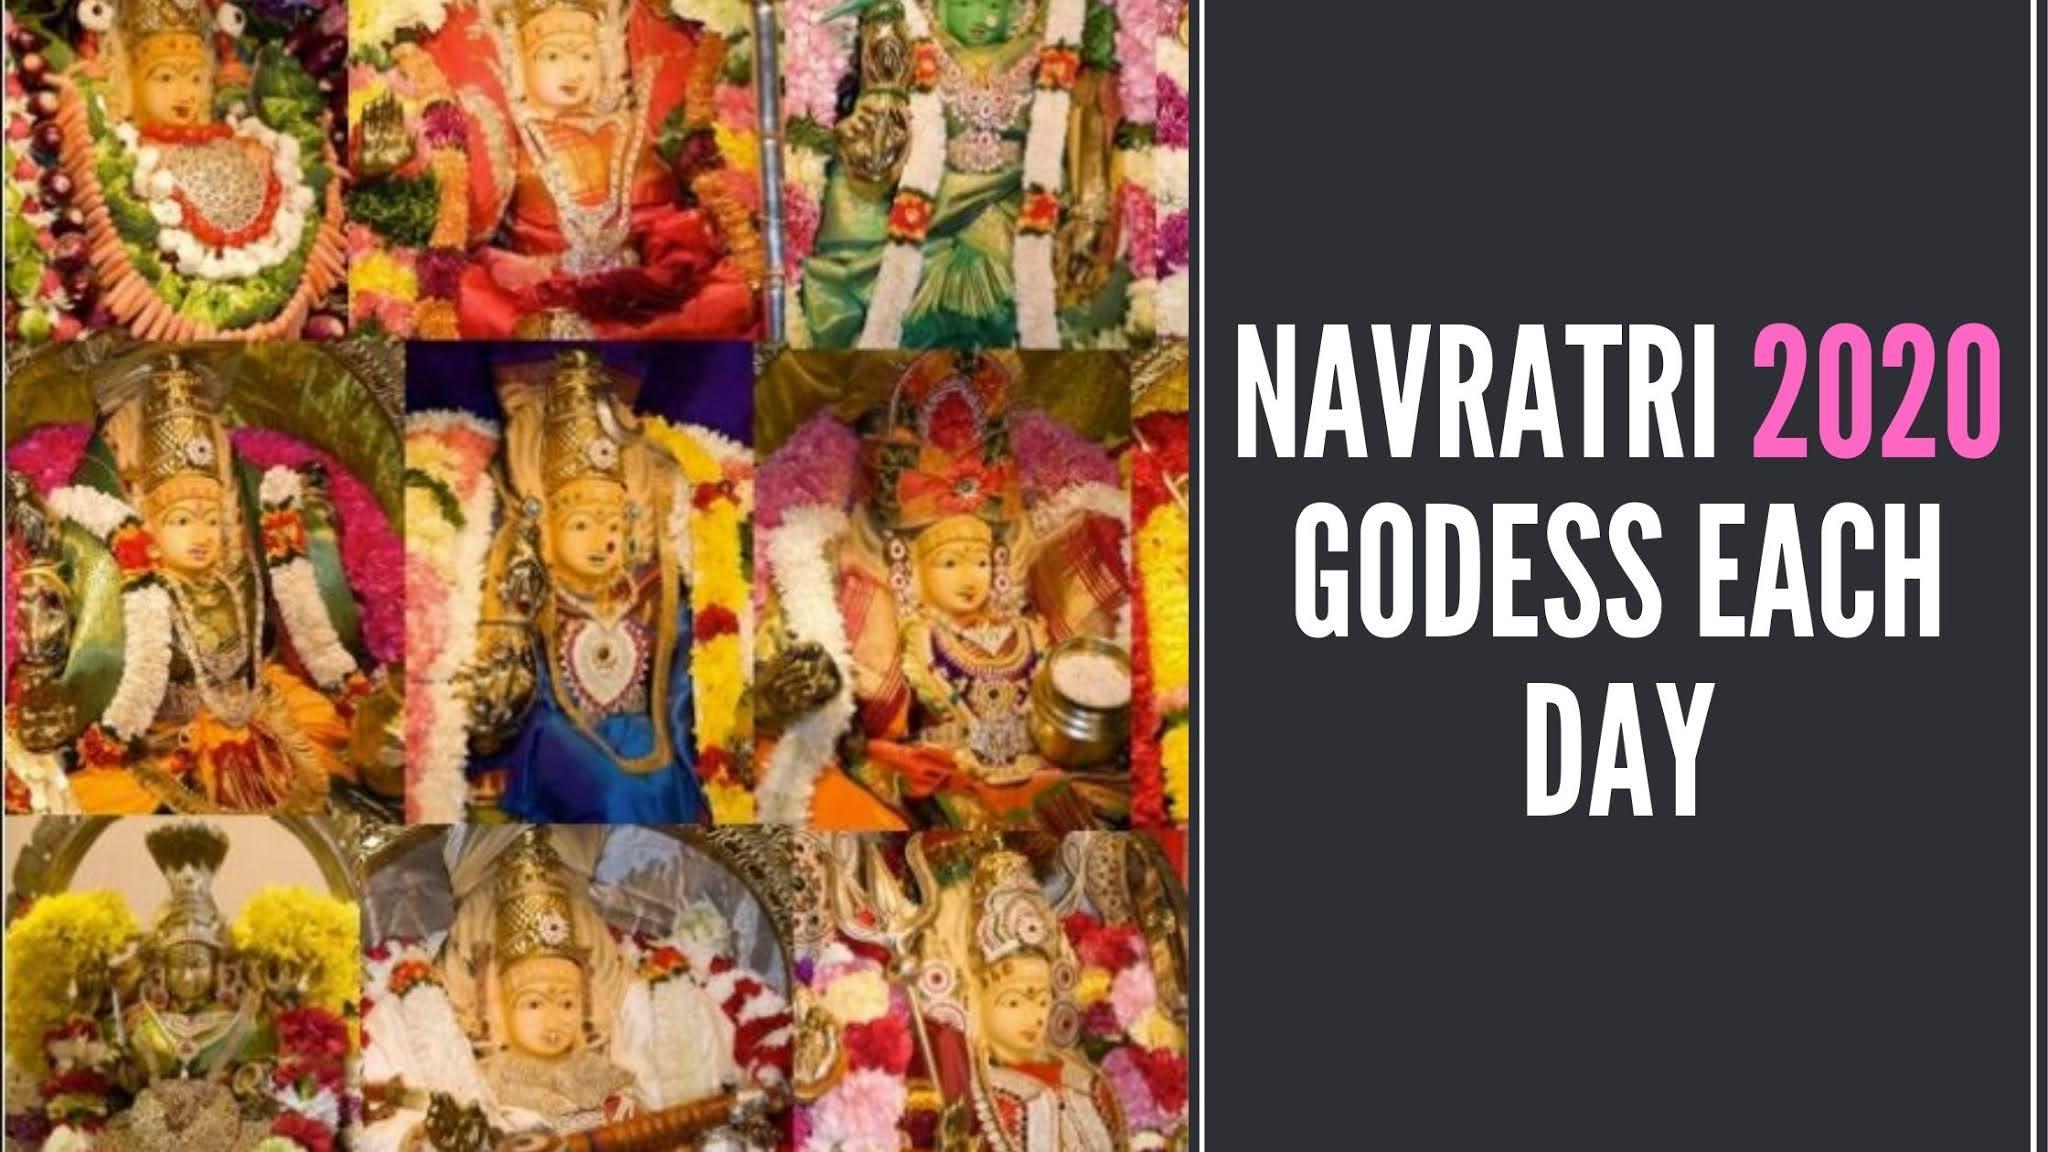 Navratri Goddess Each Day